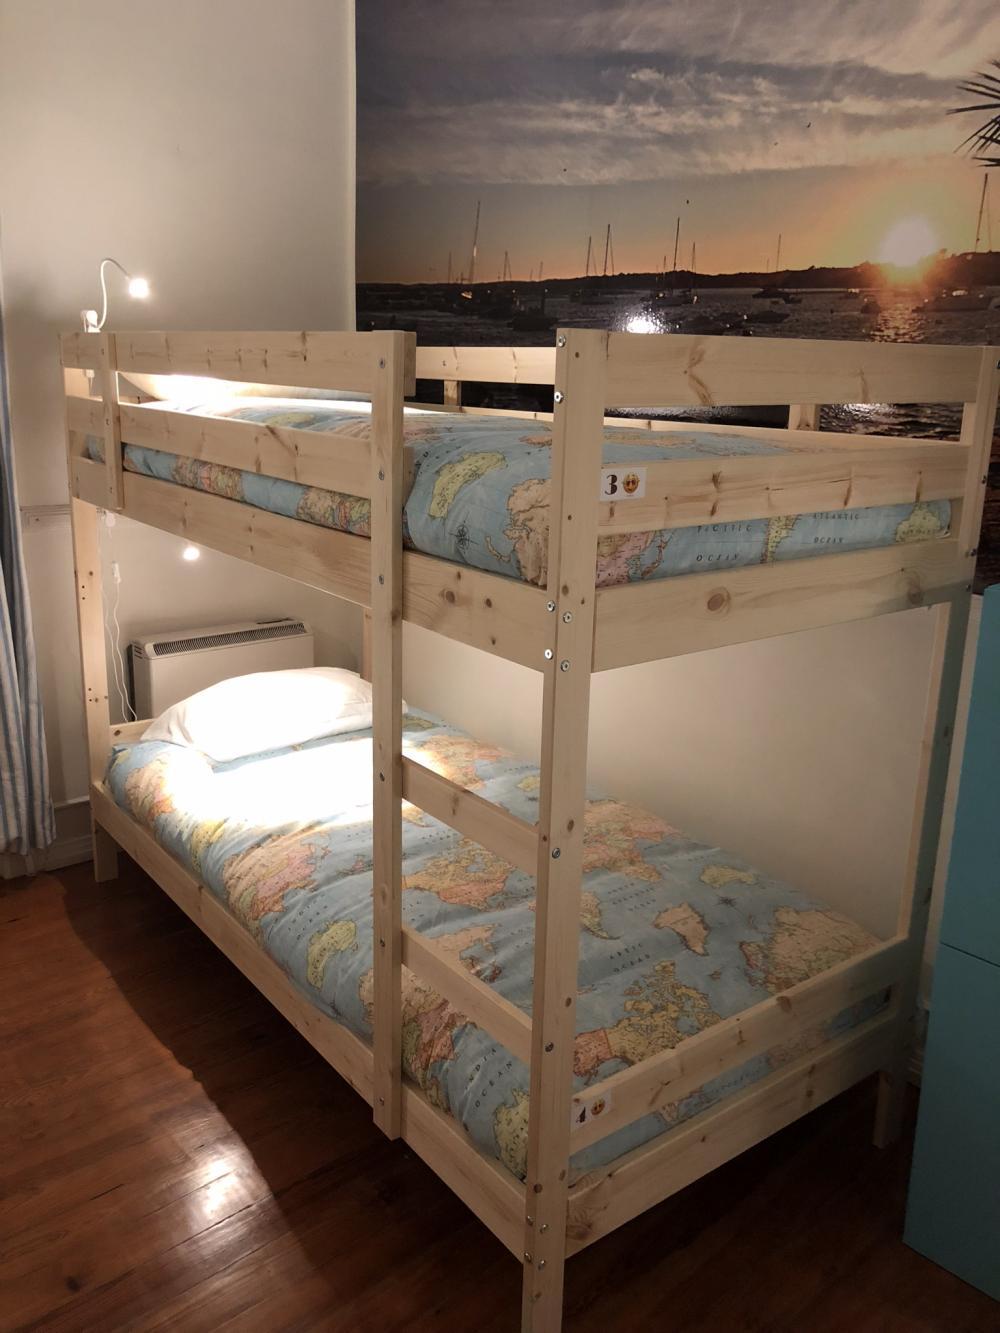 CoolPeople Hostel